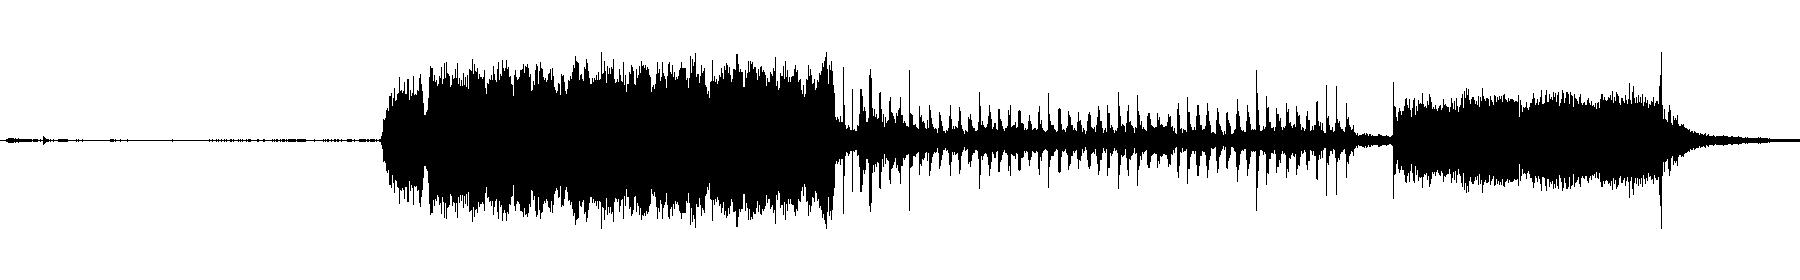 atmos 7